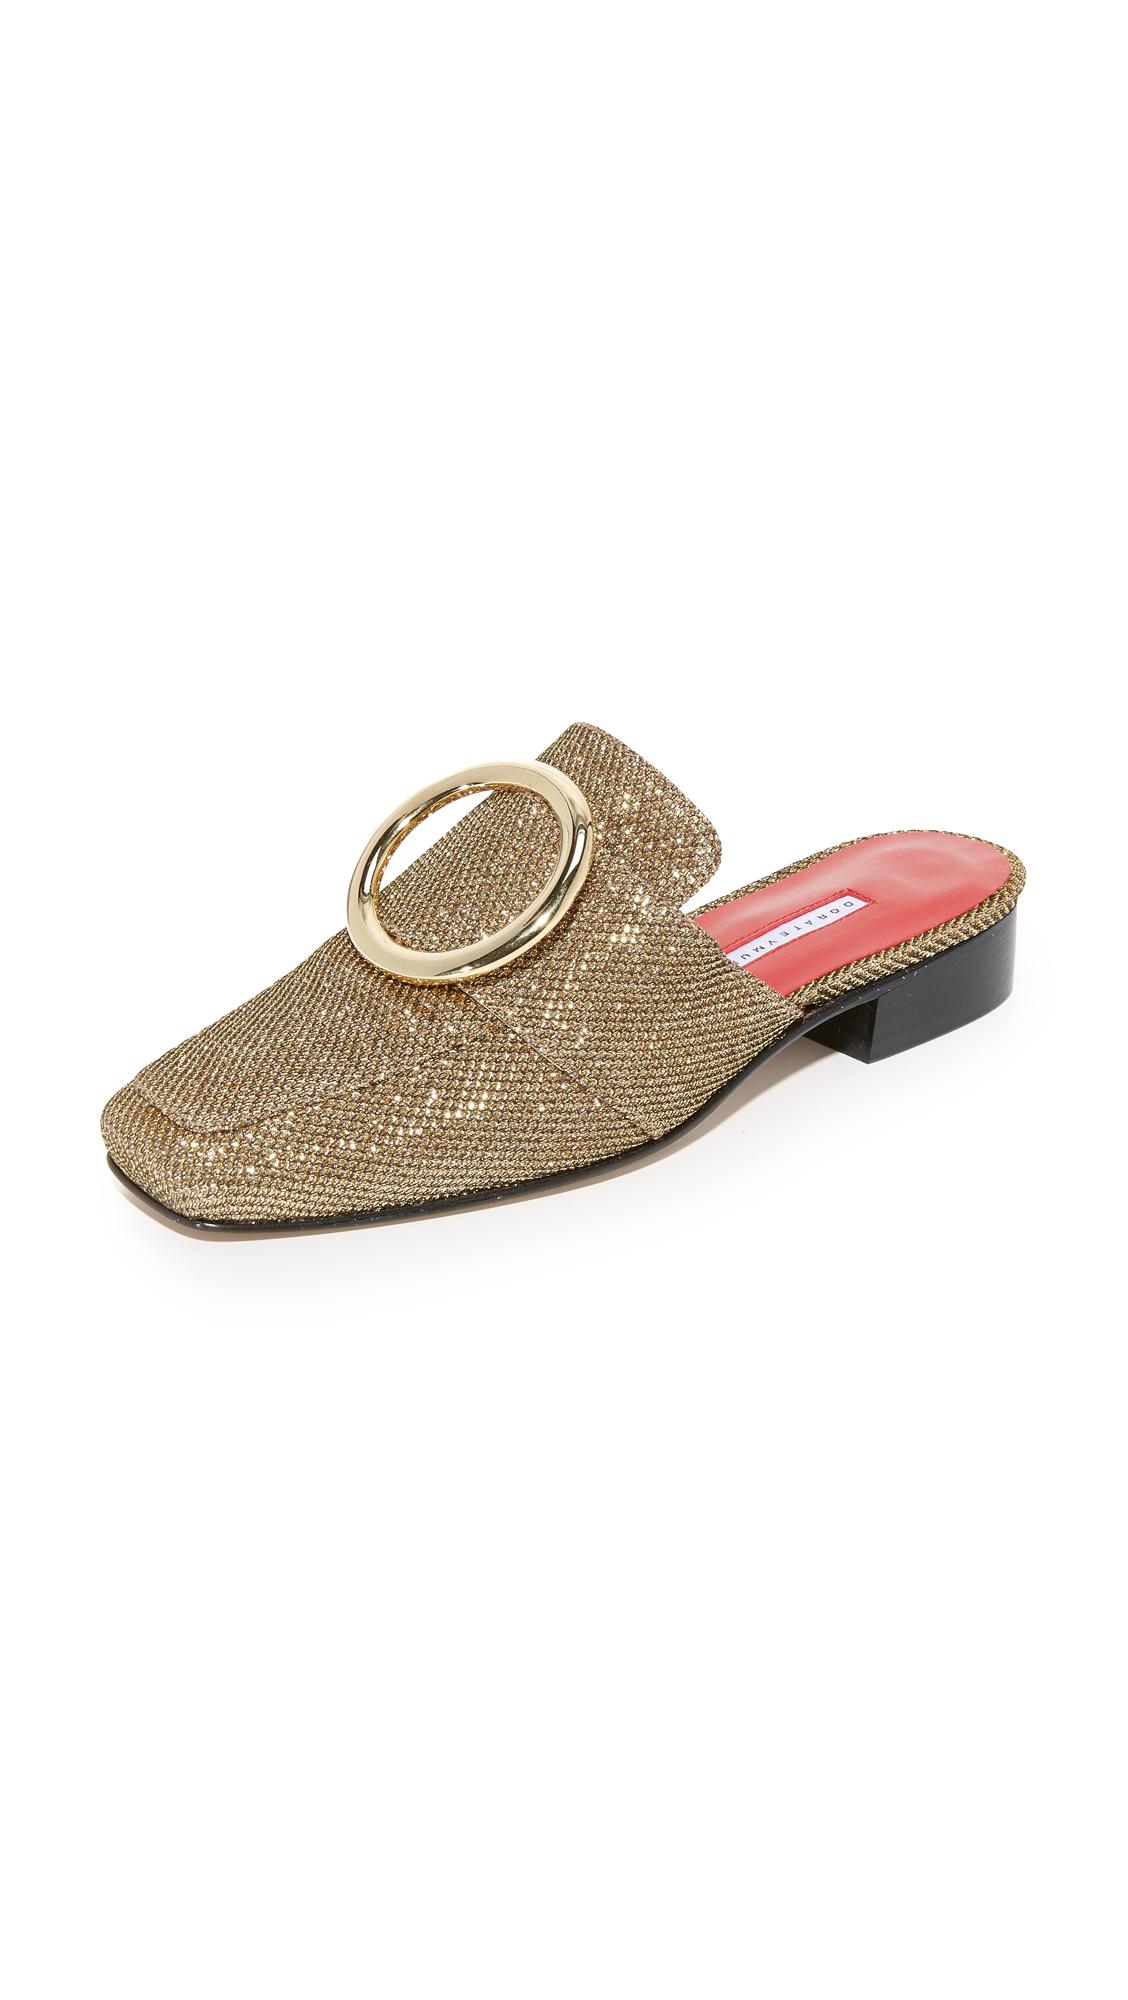 Dorateymur Petrol Slides - Gold at Shopbop